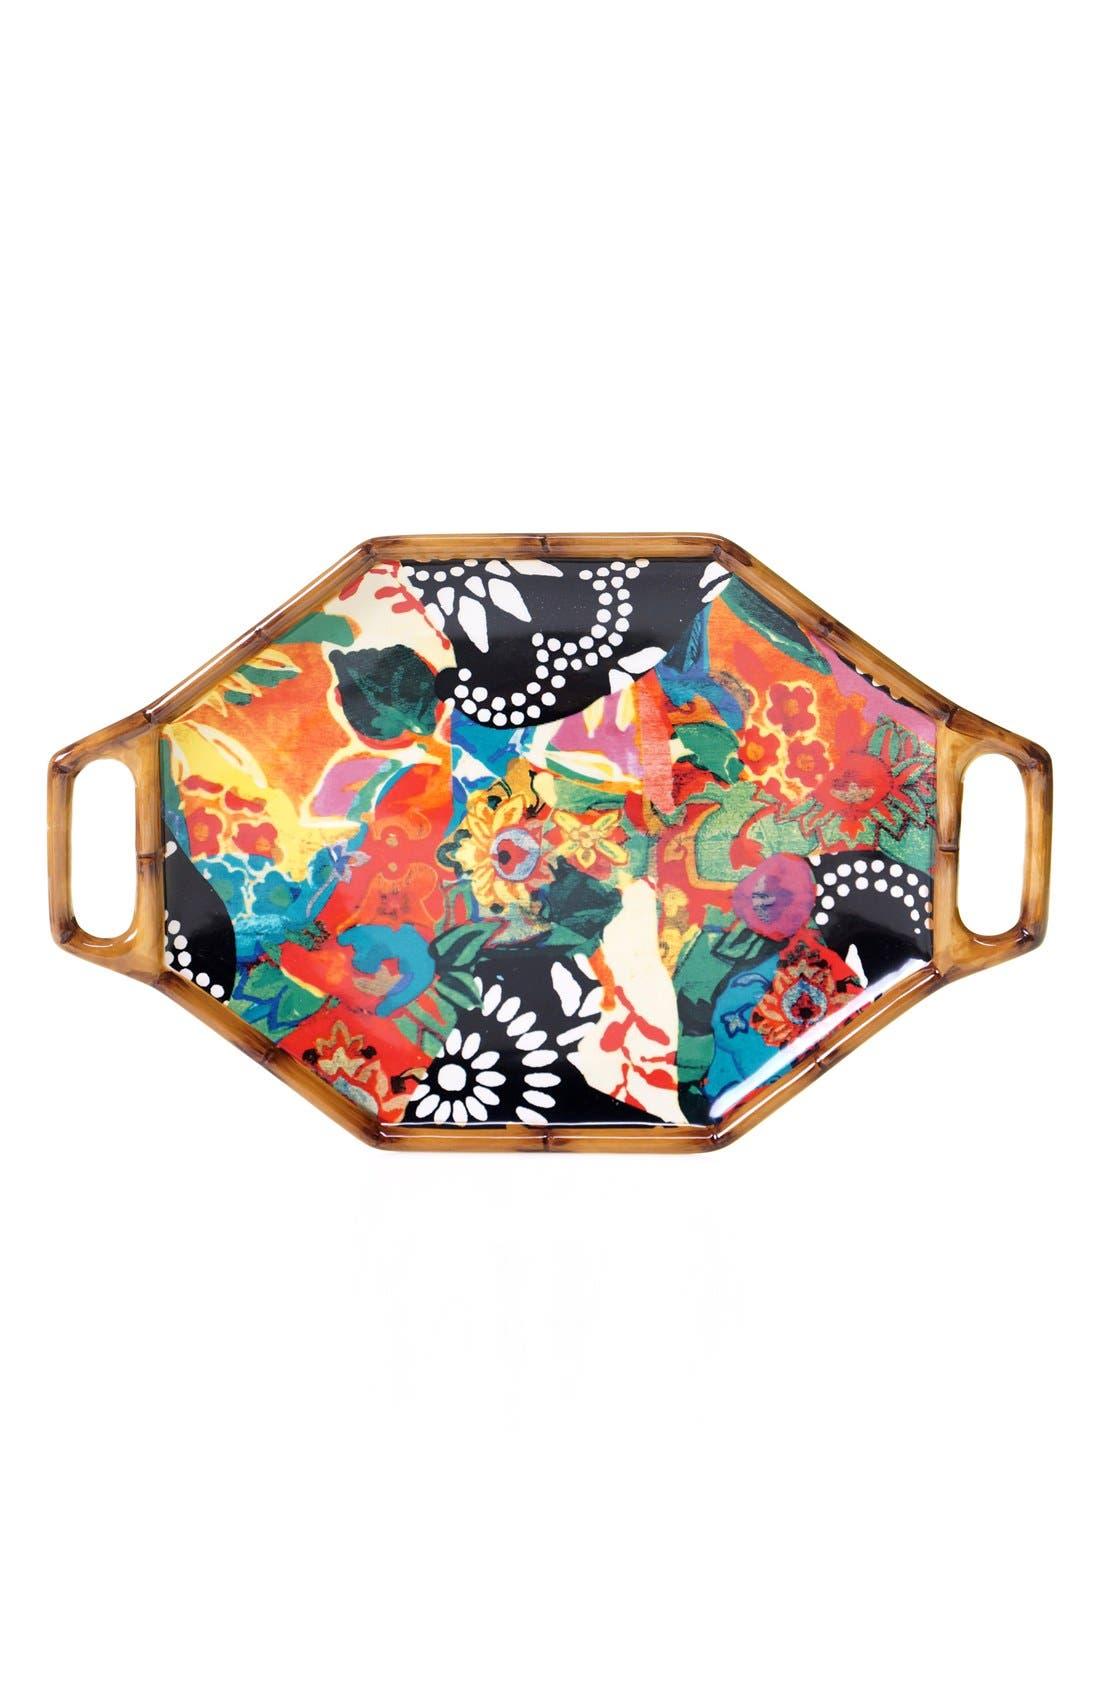 Alternate Image 1 Selected - Tracy Porter® For Poetic Wanderlust® 'Magpie' Oval Platter